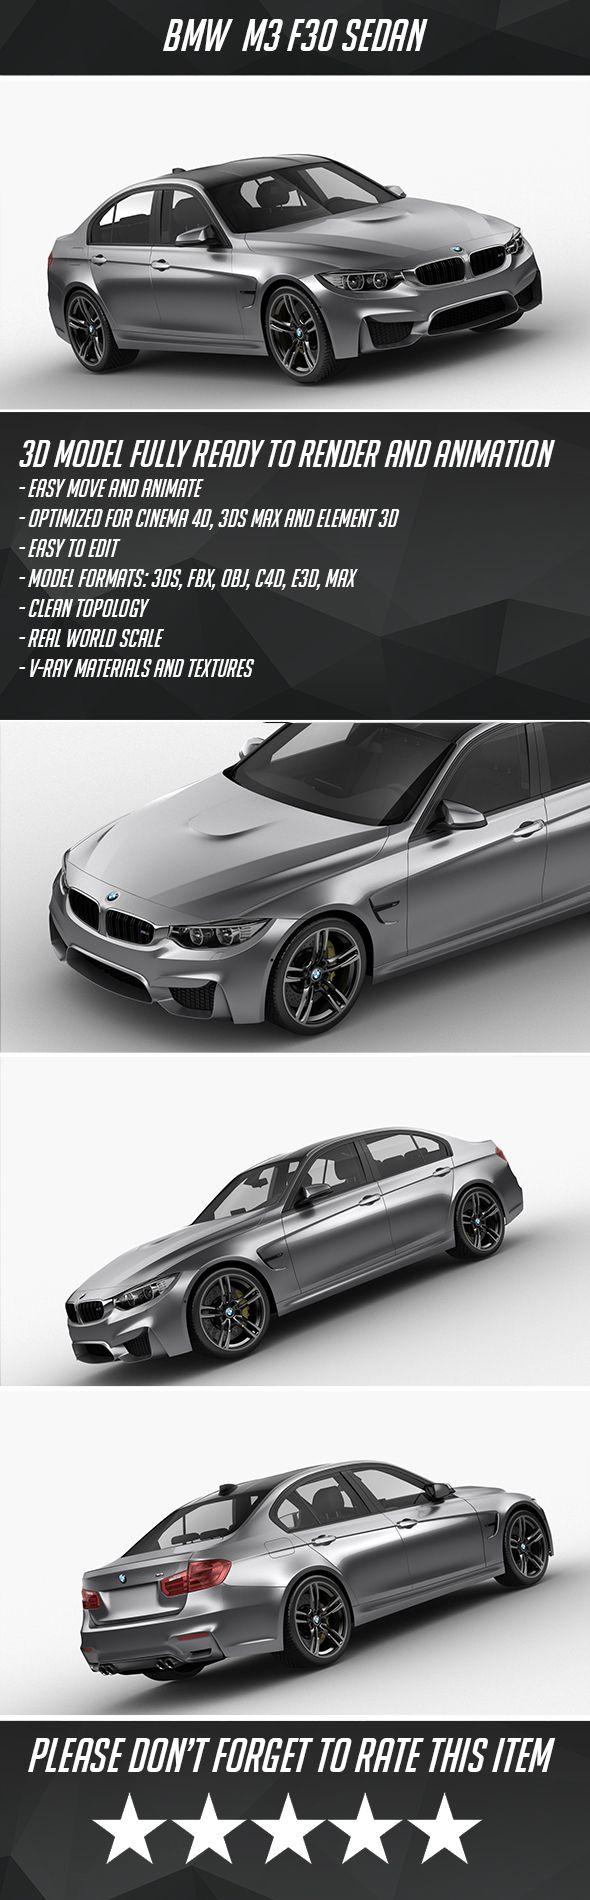 Bmw M3 F30 Sedan 2015 Fully Editable And Reusable 3d Model Of A Car 3d 3dmodel 3ddesign 4 Door 4d Bmw Car Cineam4d Element3d F 30 Bmw M3 Bmw Sedan